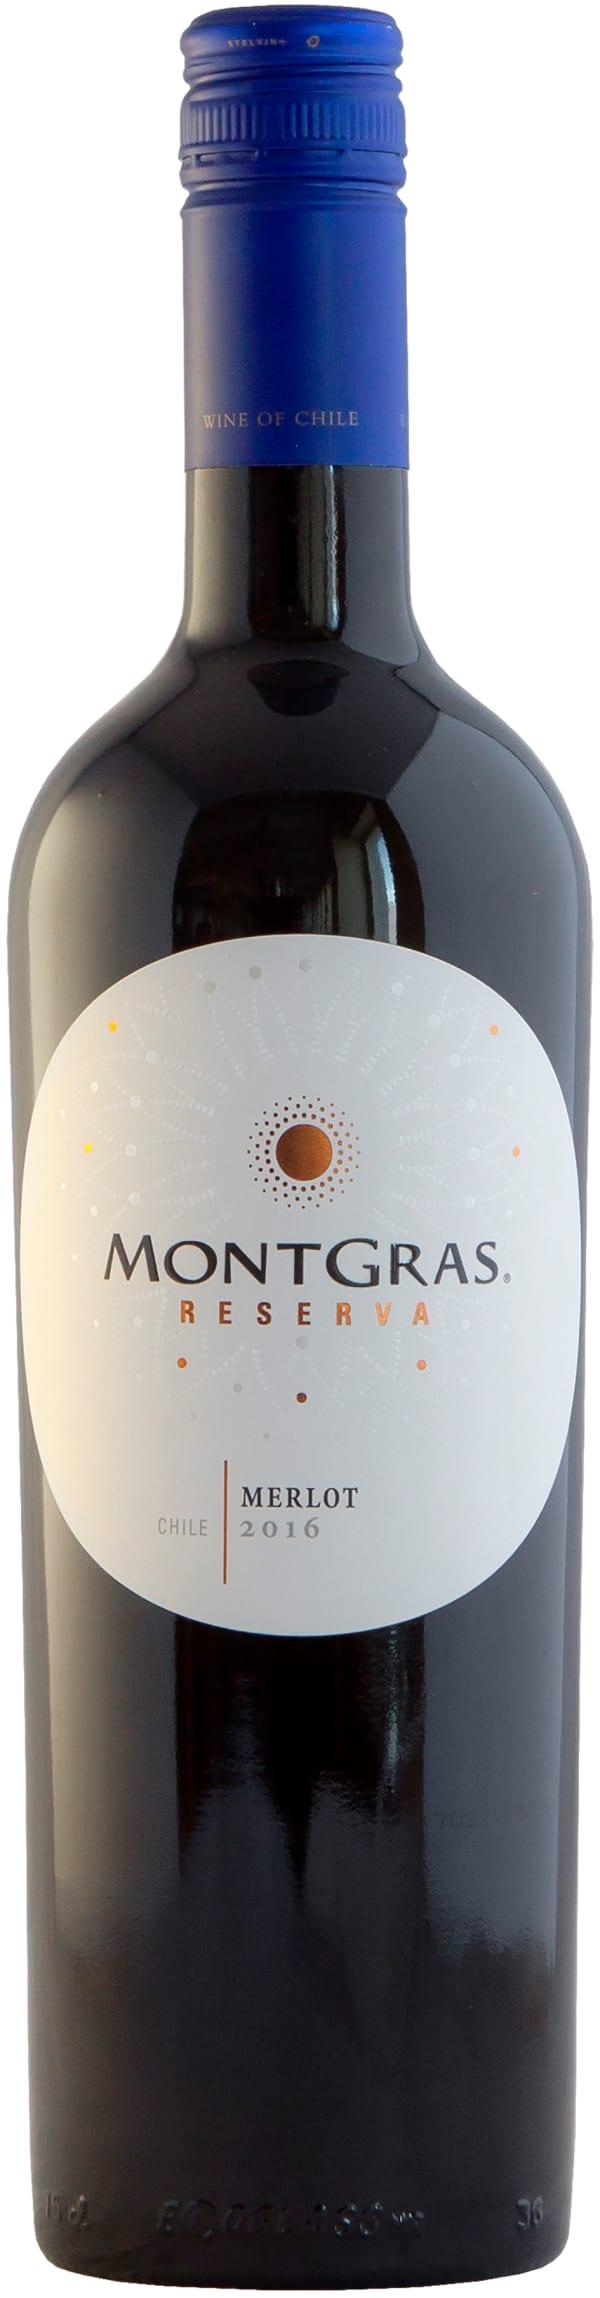 MontGras Merlot Reserva 2017